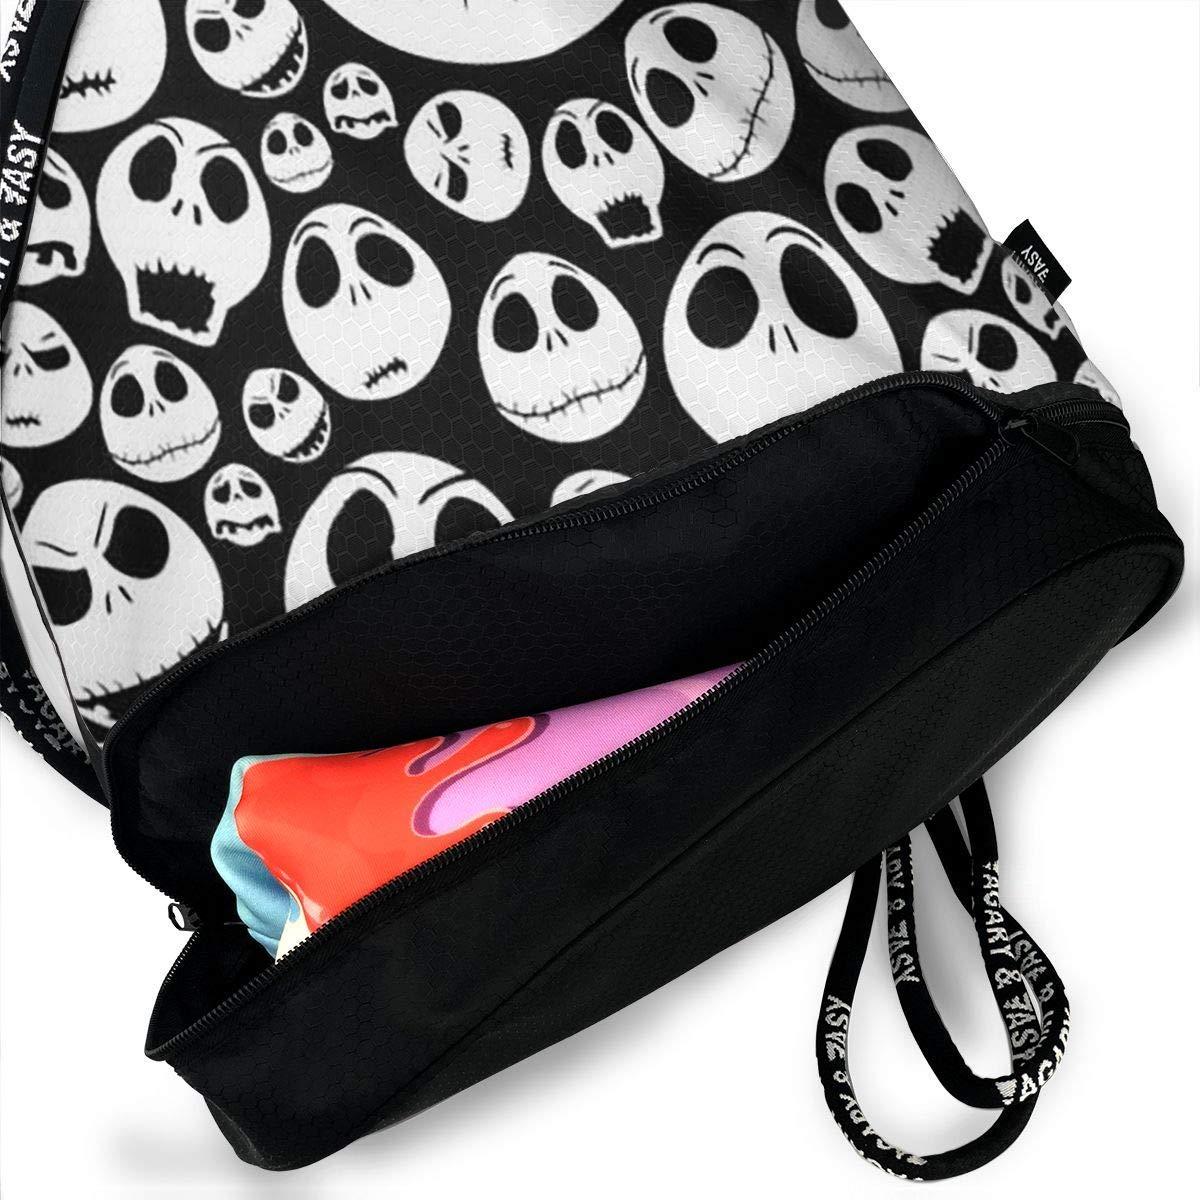 Bolsa de Deporte Halloween Skull Cord/ón Bolsa de Gimnasia para Adolescentes PmseK Mochila con Cord/ón,Bolsas de Gimnasia